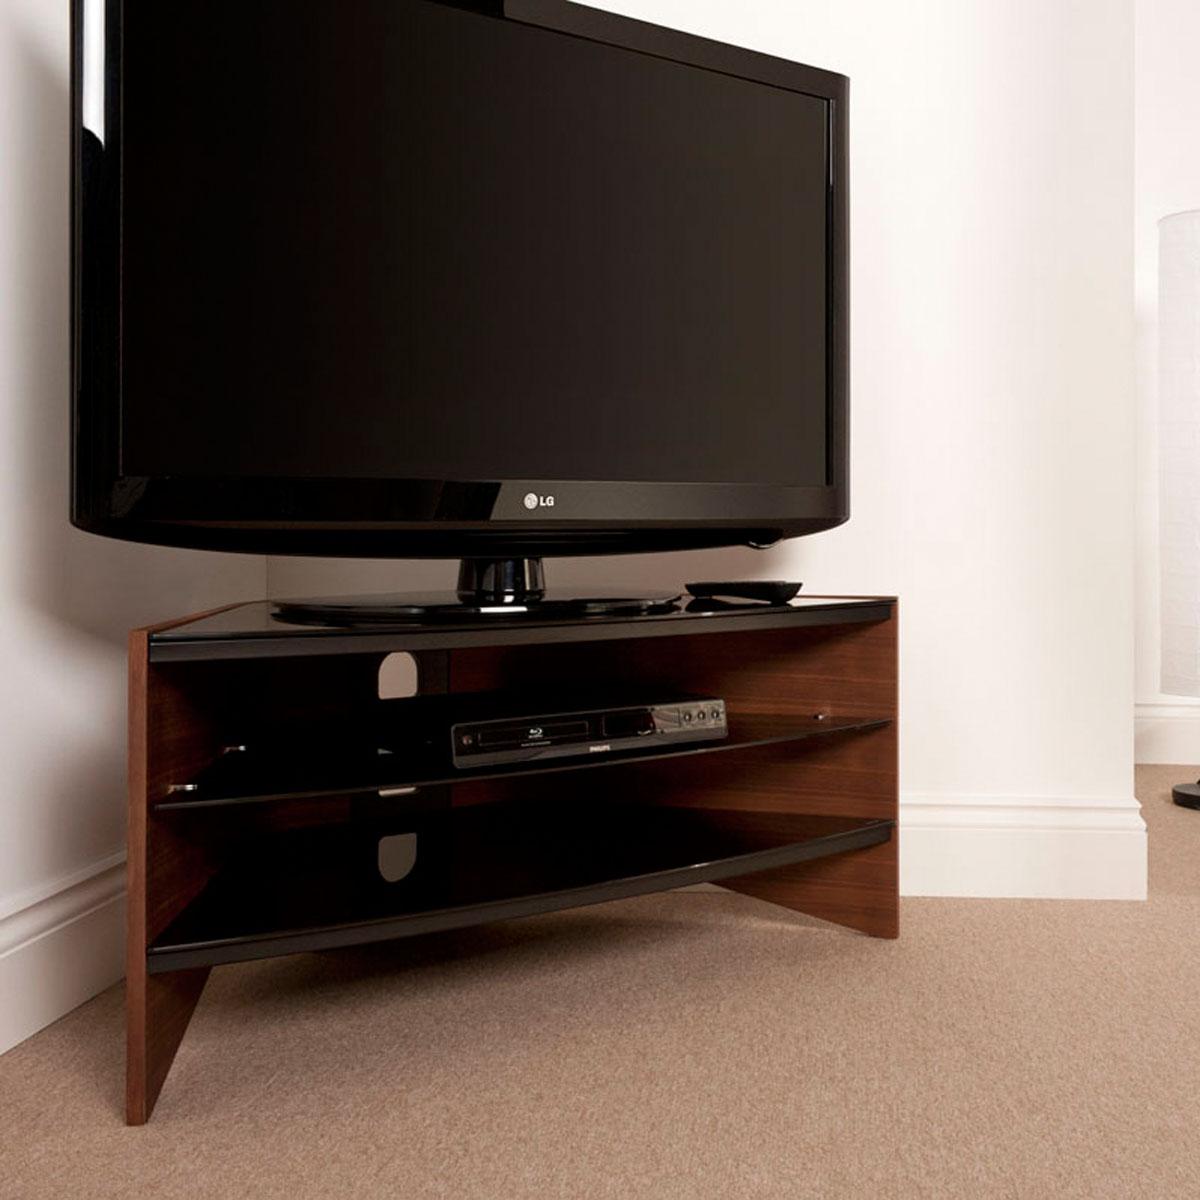 walnut 3 black glass shelf corner lcd plasma tv stand 32 42 inch screens ebay. Black Bedroom Furniture Sets. Home Design Ideas